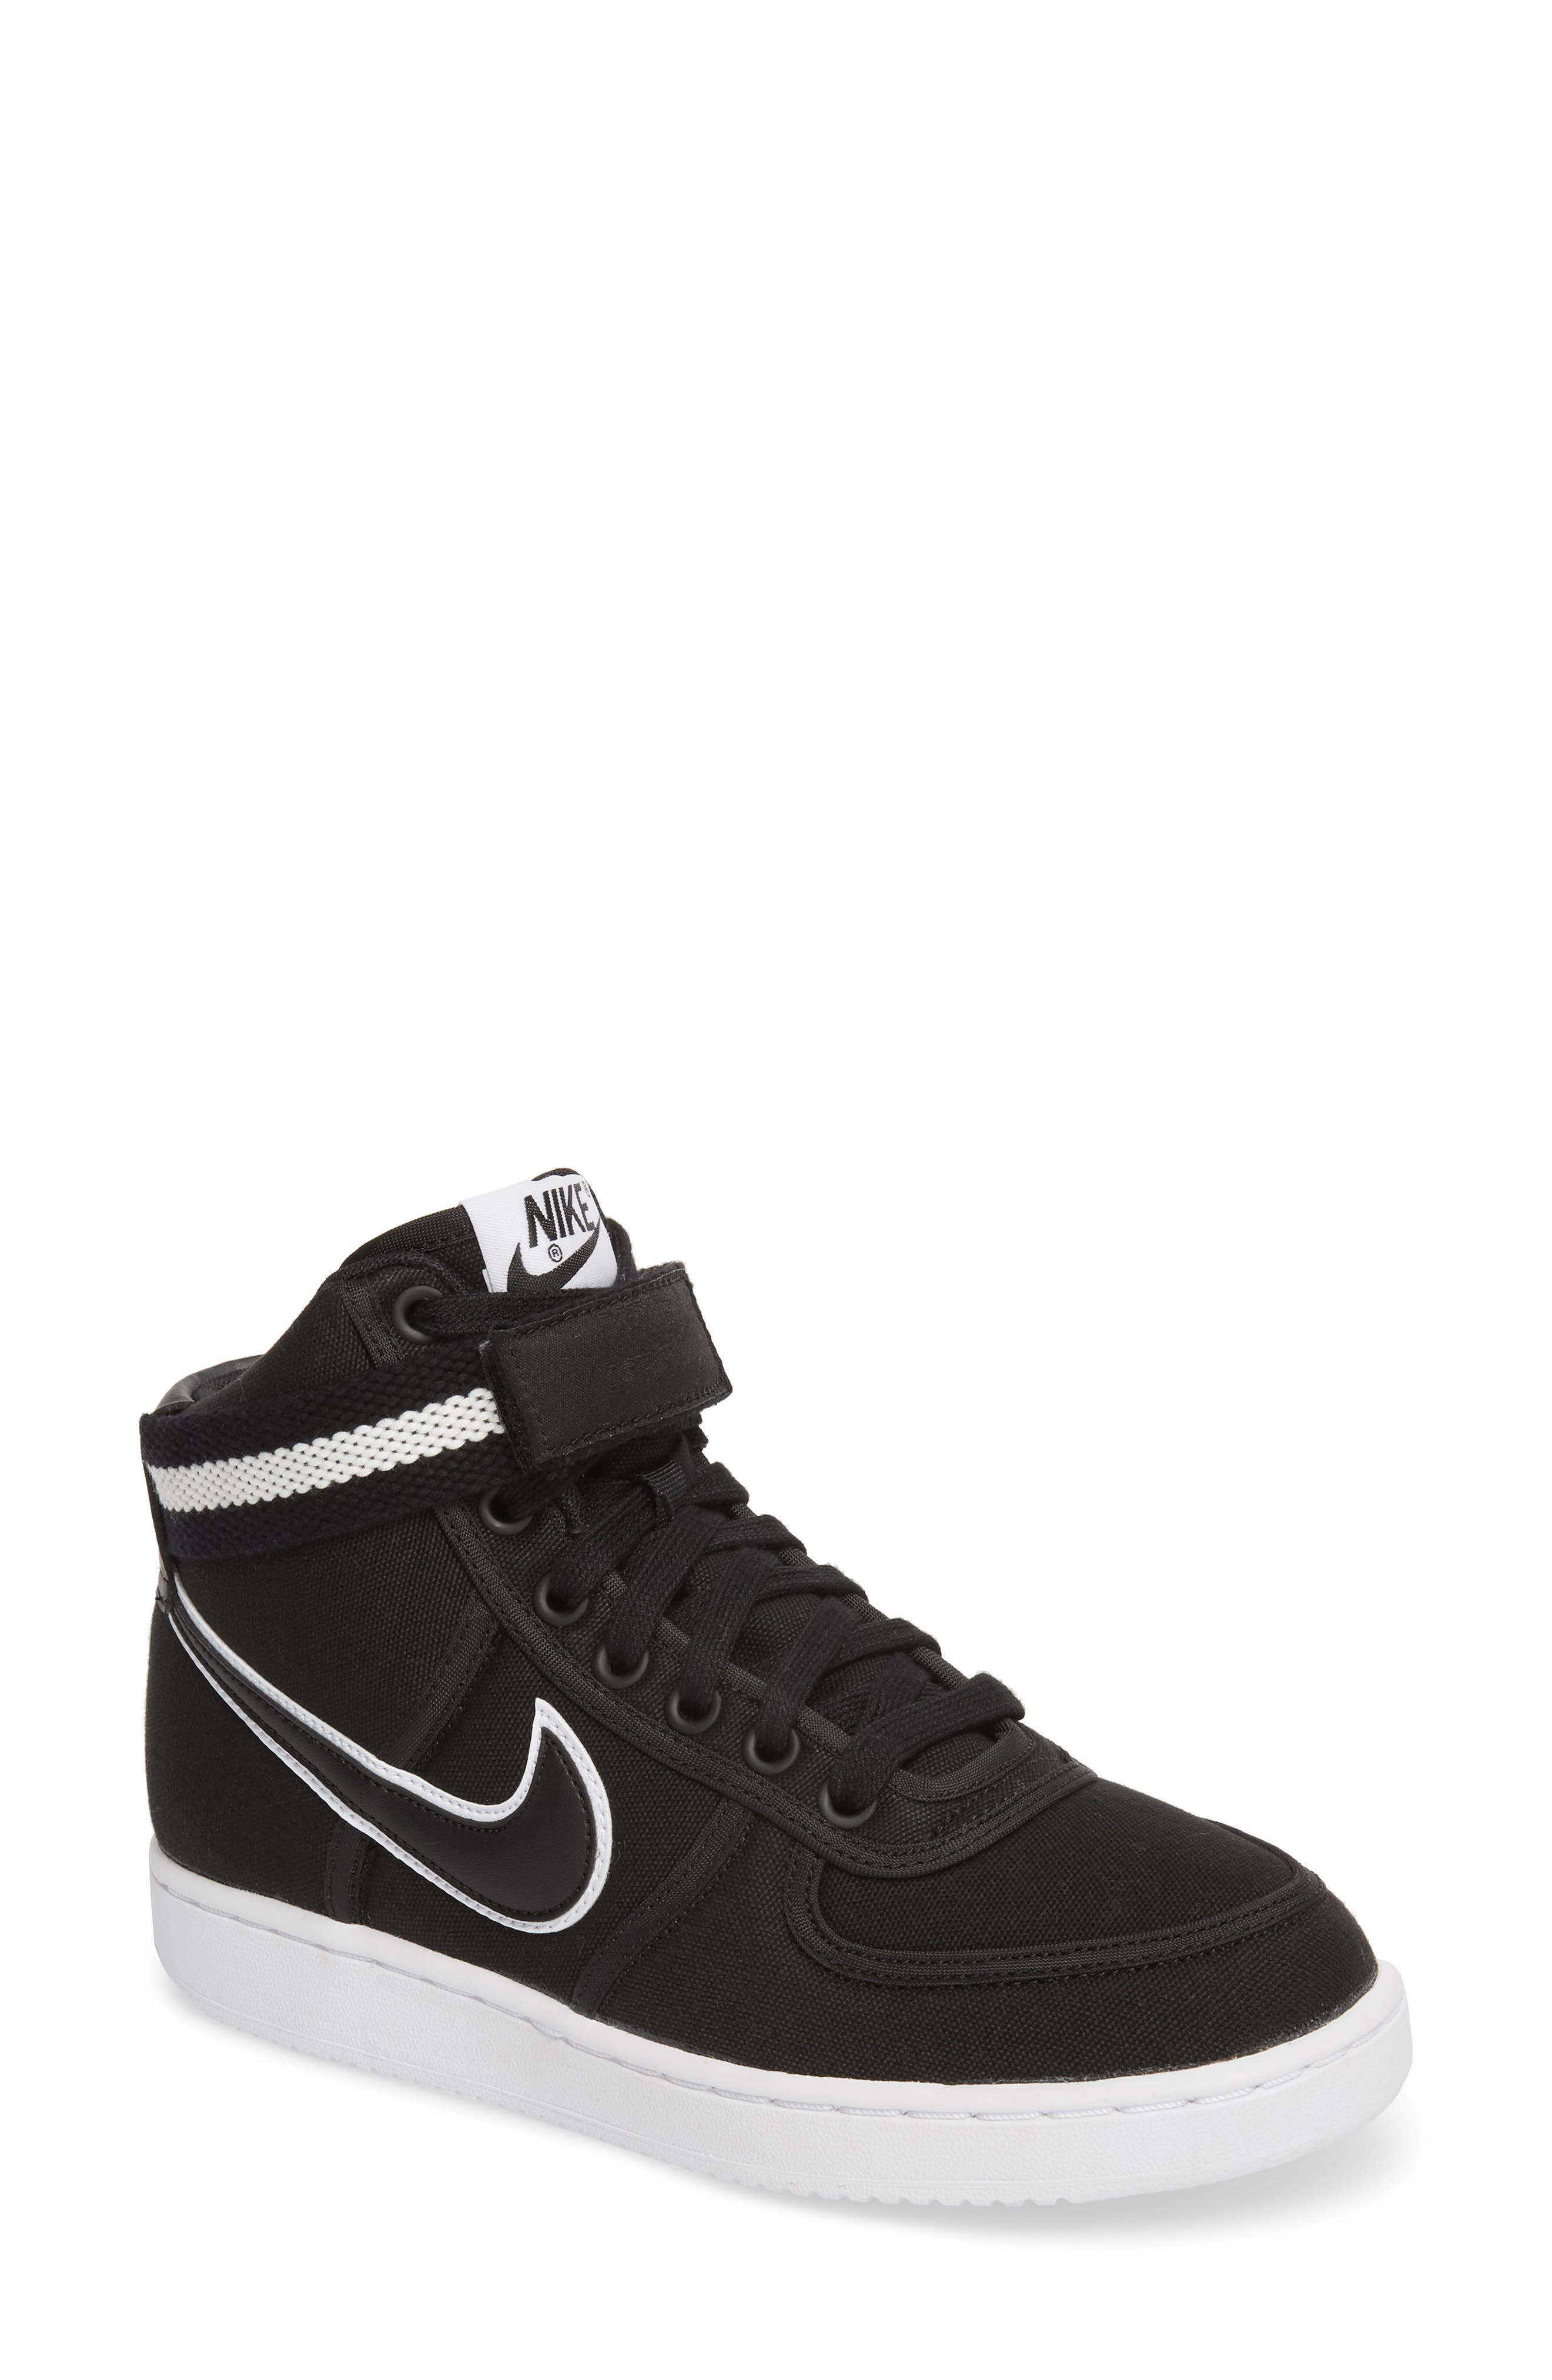 Vandal High Top Sneaker,                         Main,                         color, Black/ Black-White